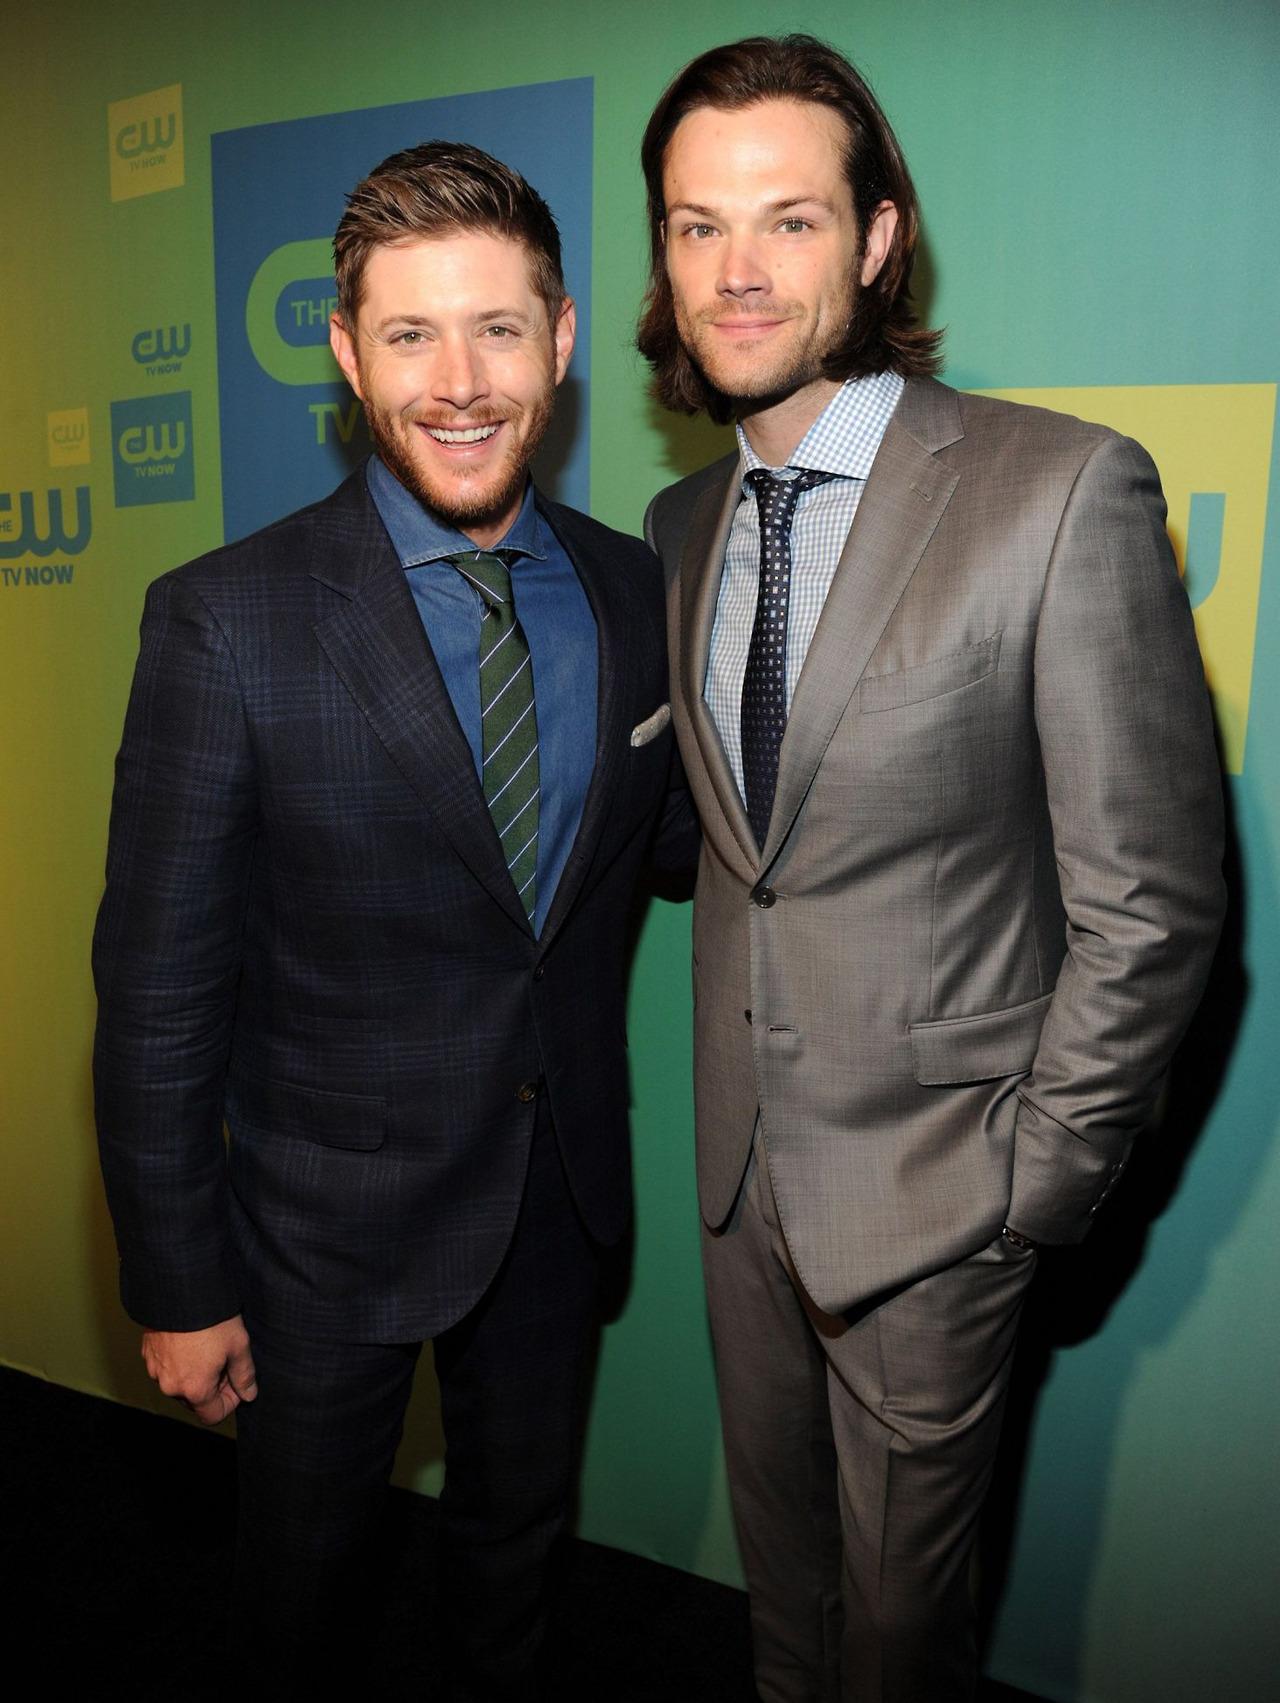 CW Upfronts 2014 - Jared Padalecki Photo (37084050) - Fanpop